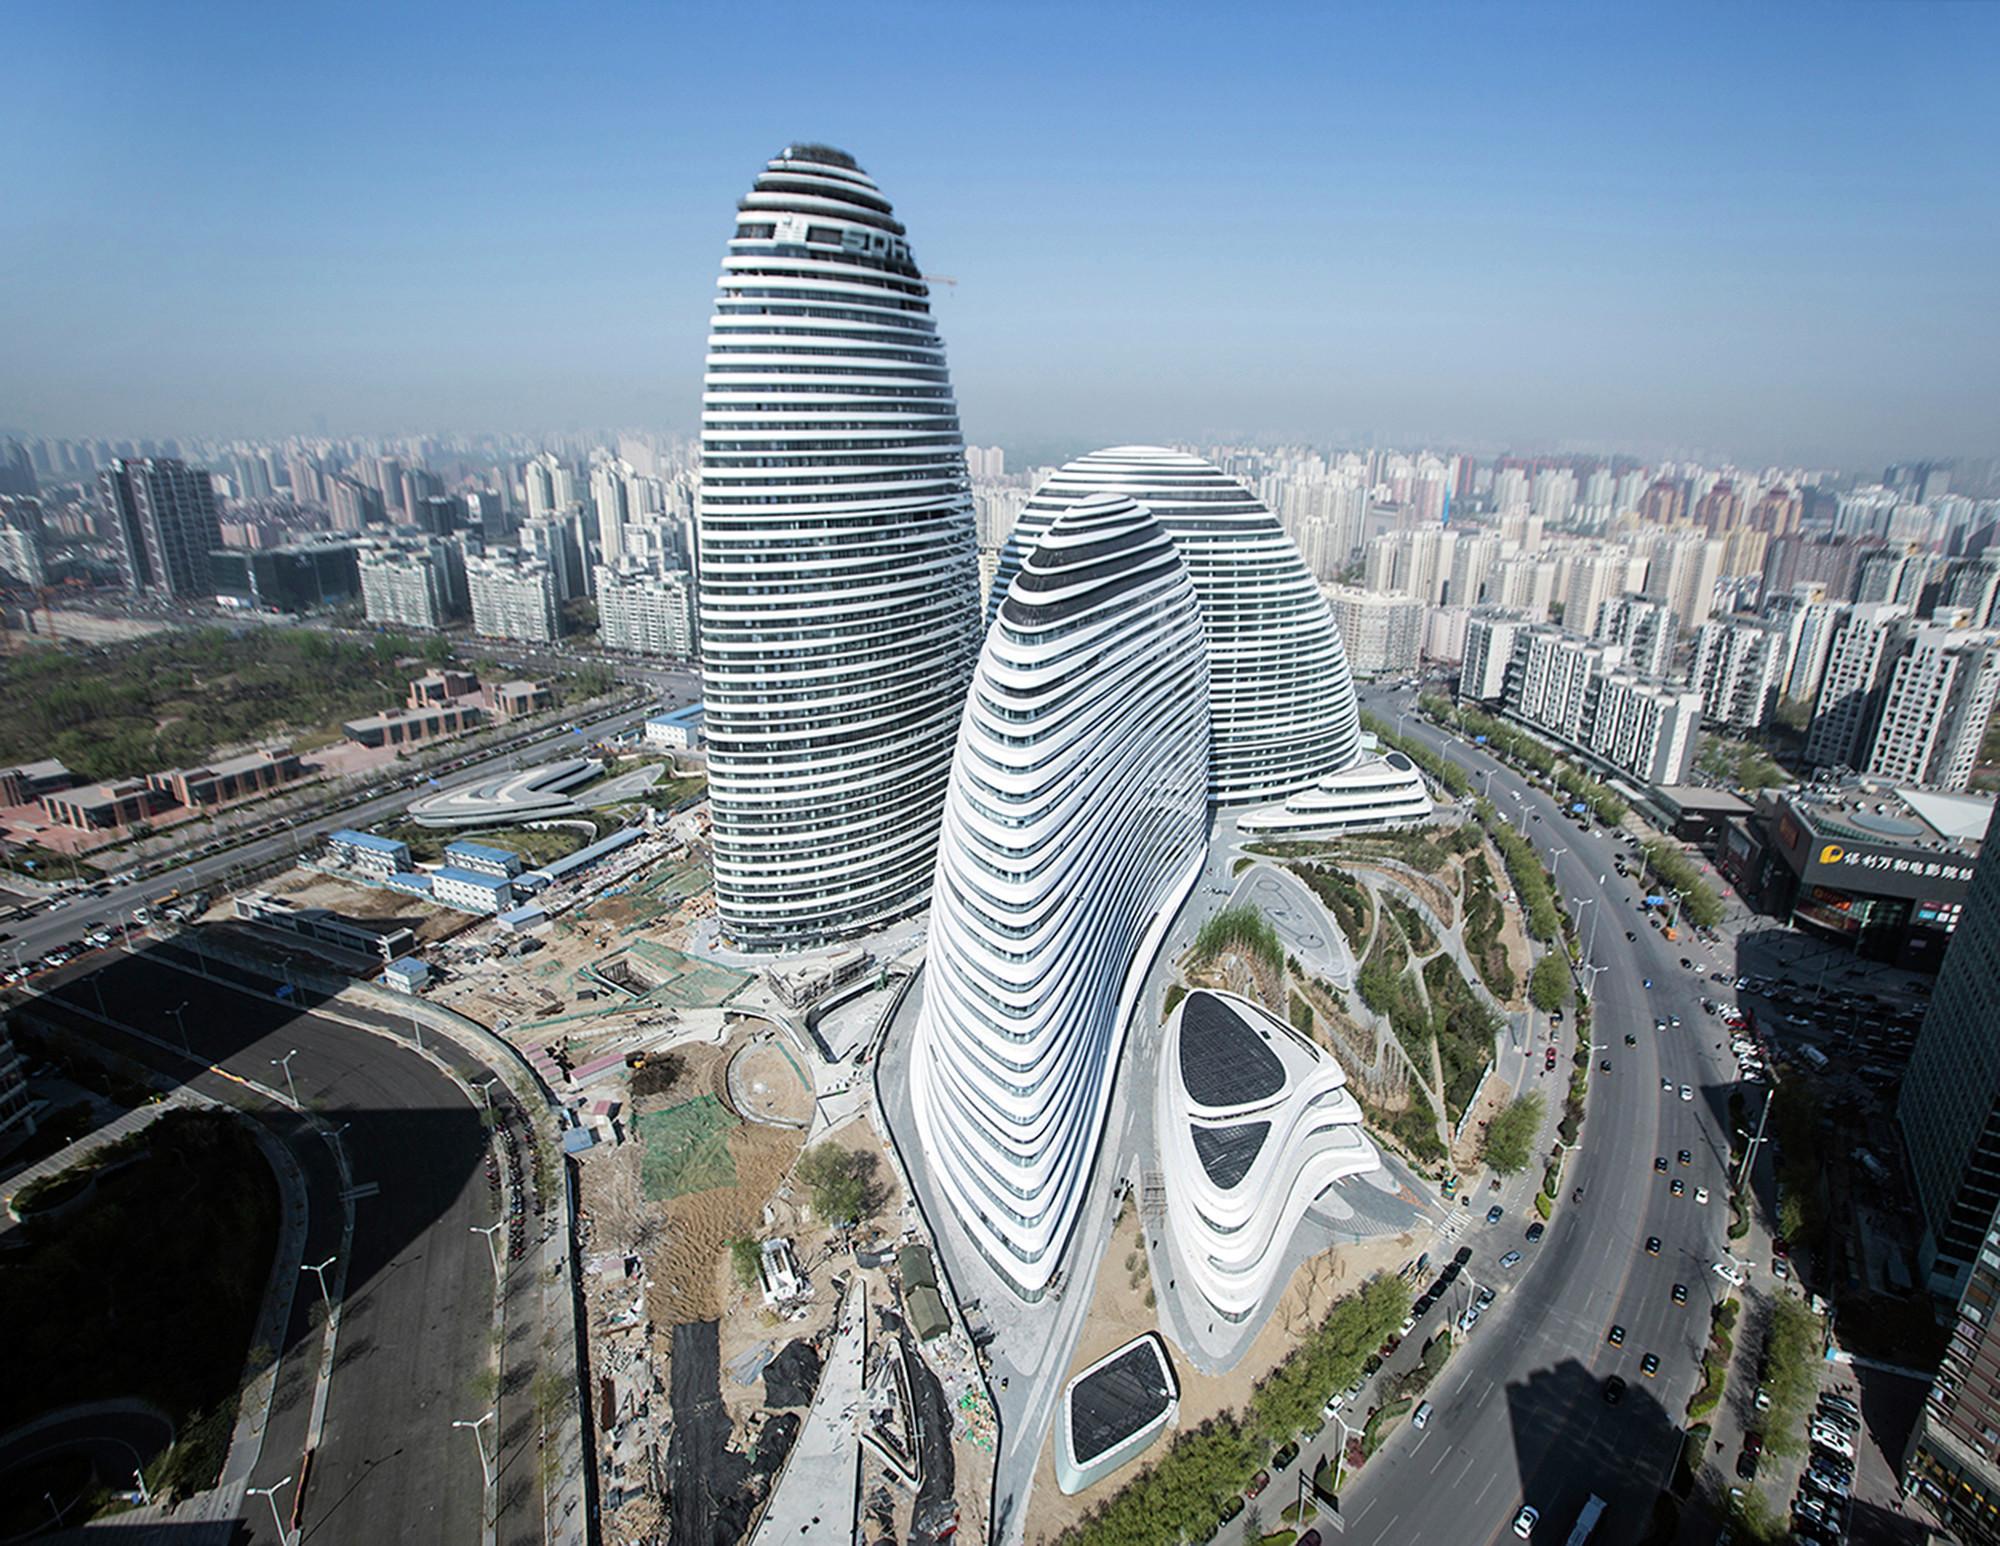 zaha hadids wangjing soho wins emporis skyscraper award - Zaha Hadid Architect Buildings